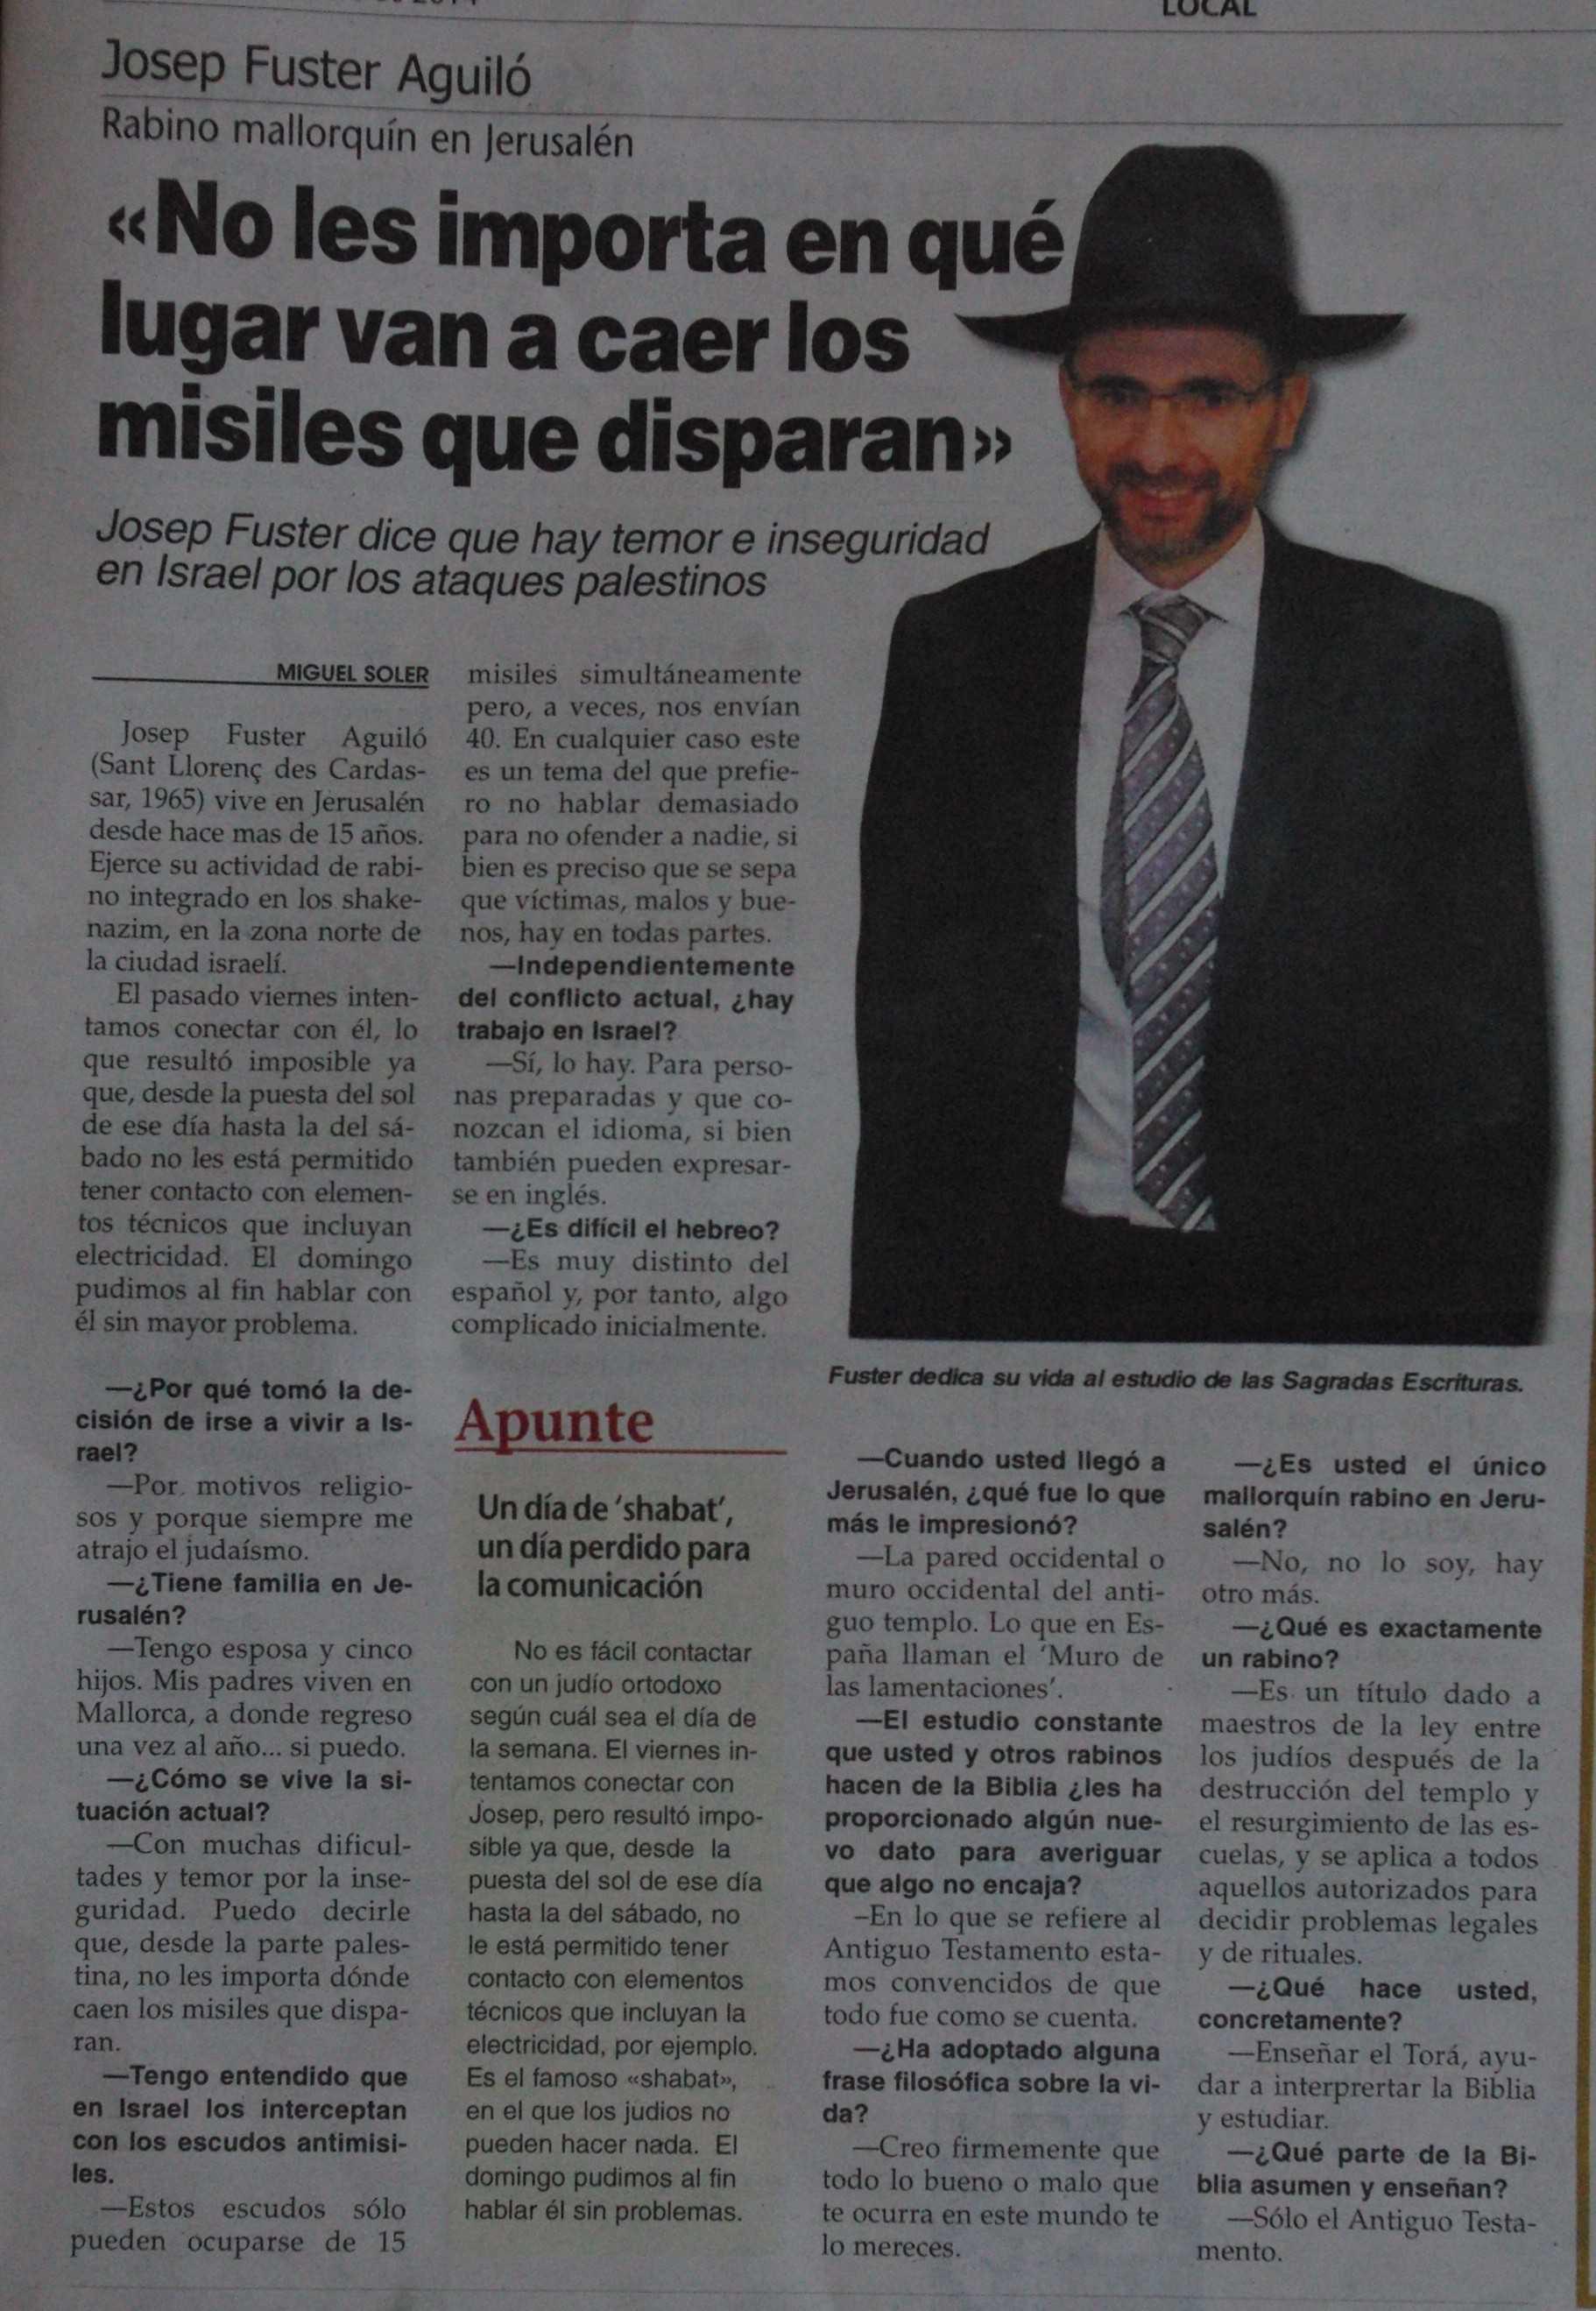 Josep Fuster